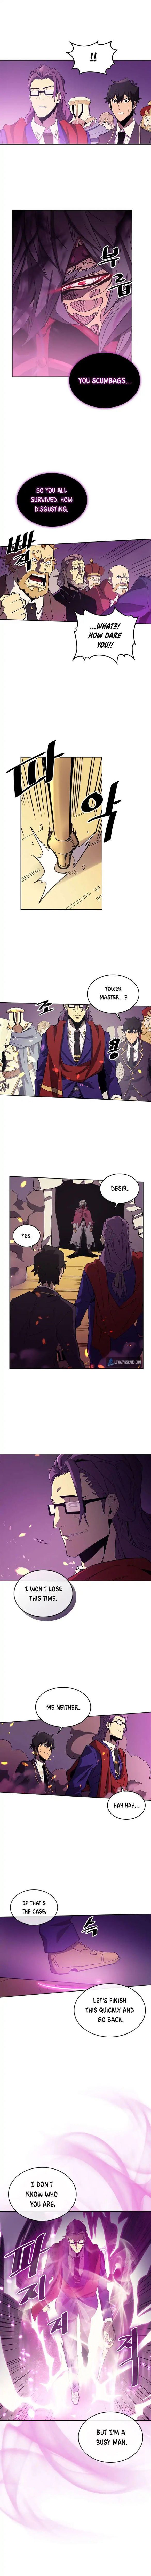 A Returner's Magic Should Be Special Chapter 79 page 8 - Mangakakalots.com